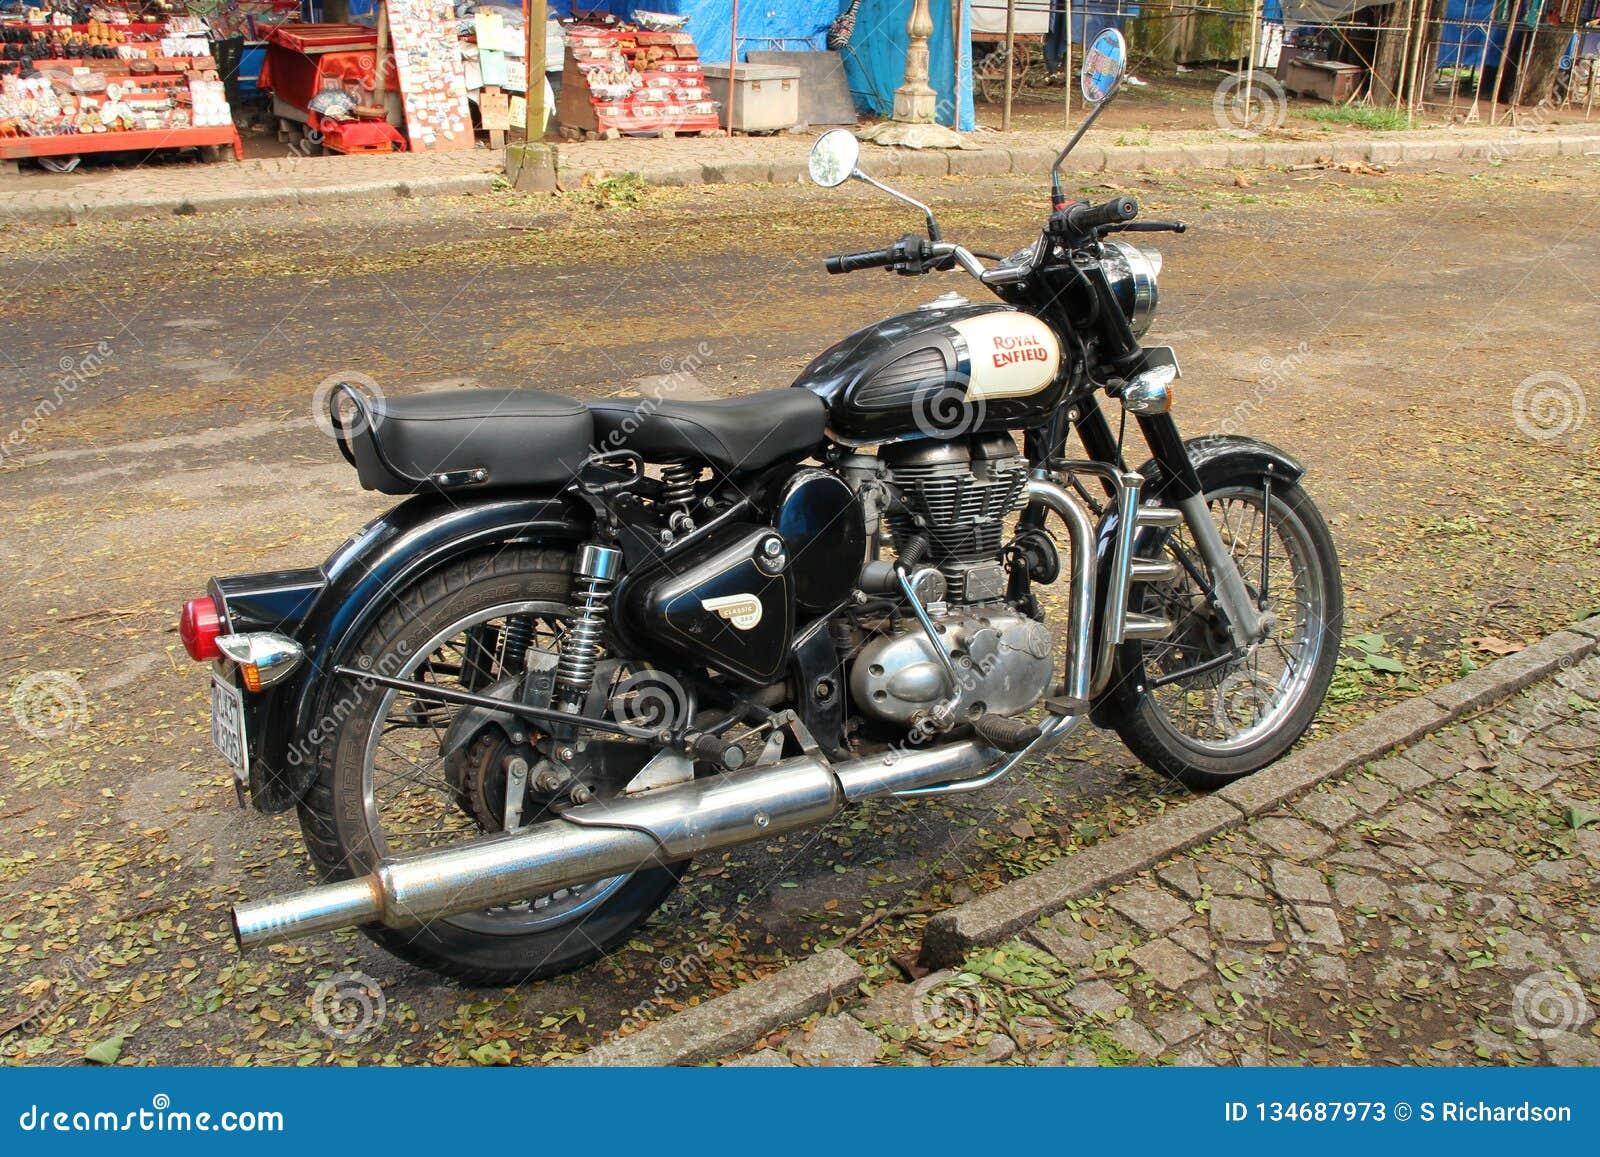 Royal Enfield Bullet Editorial Stock Photo Image Of Motorcycle